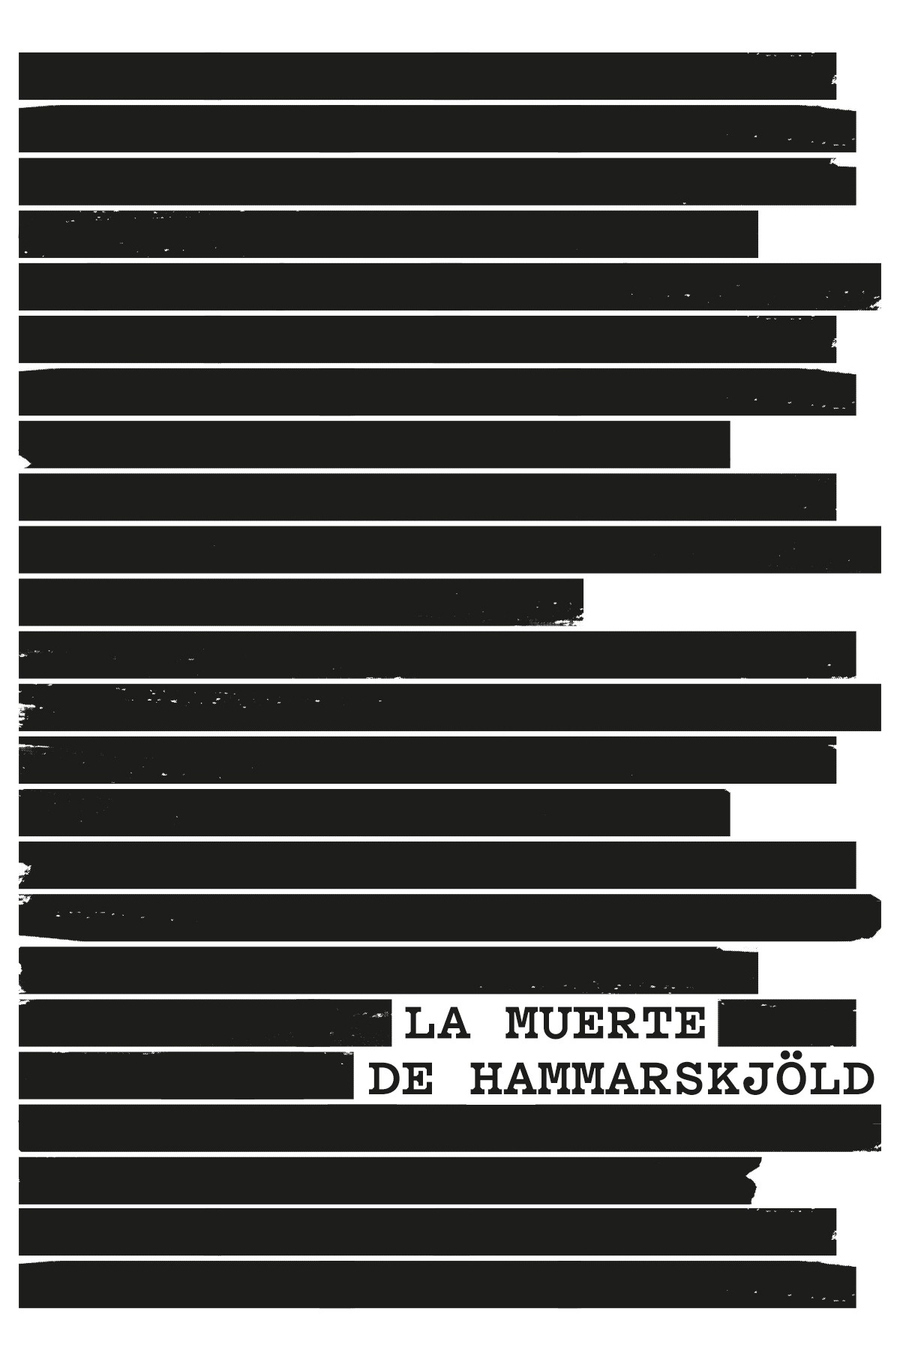 La muerte de Hammarskjöld